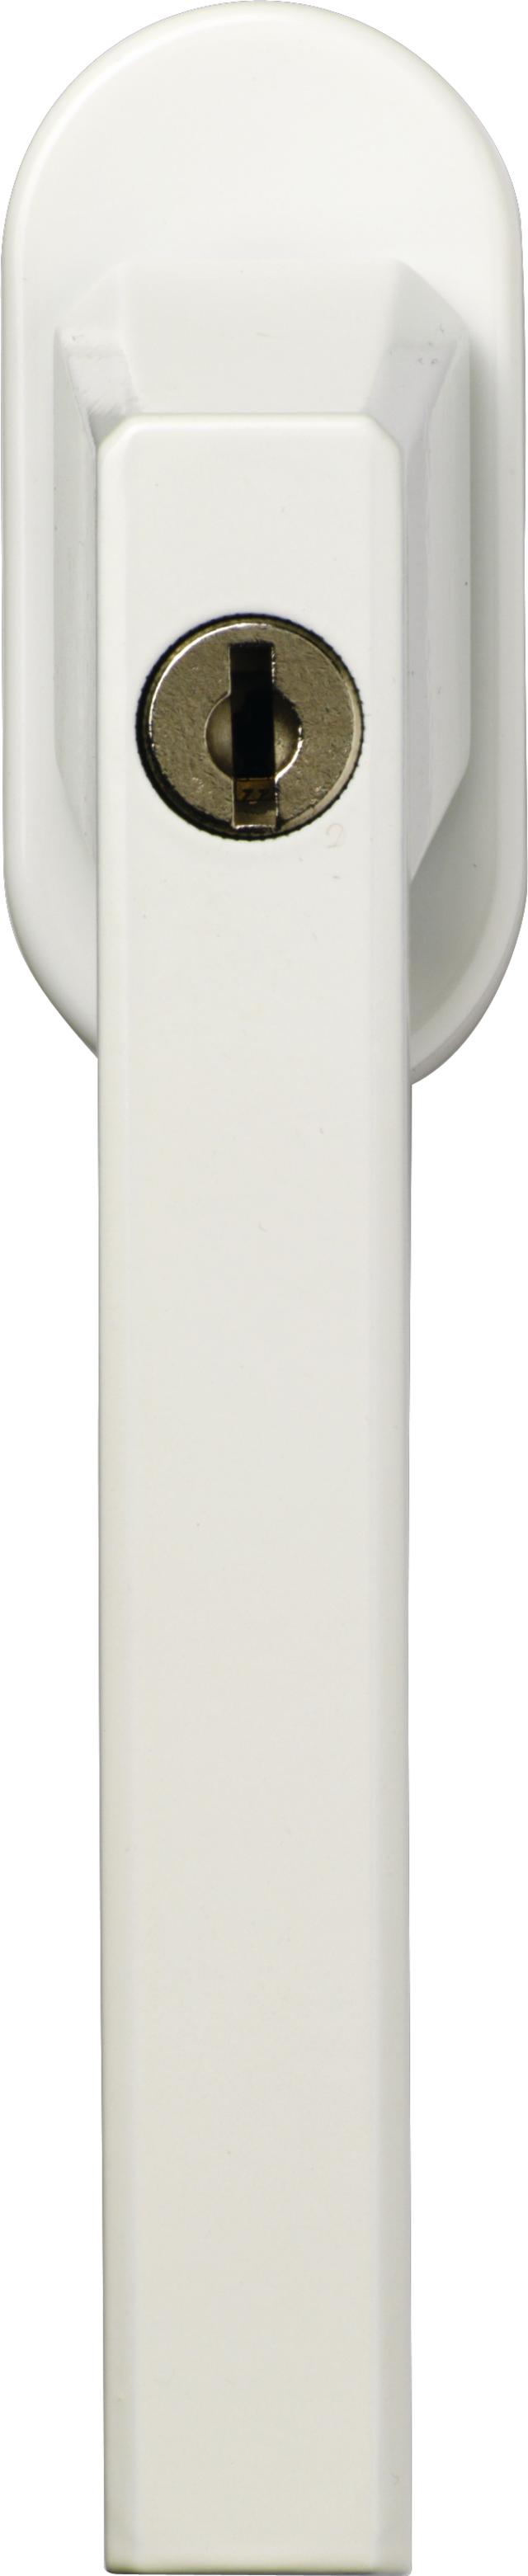 Abschließbarer Fenstergriff FG110 W Triples CL/DFNLI